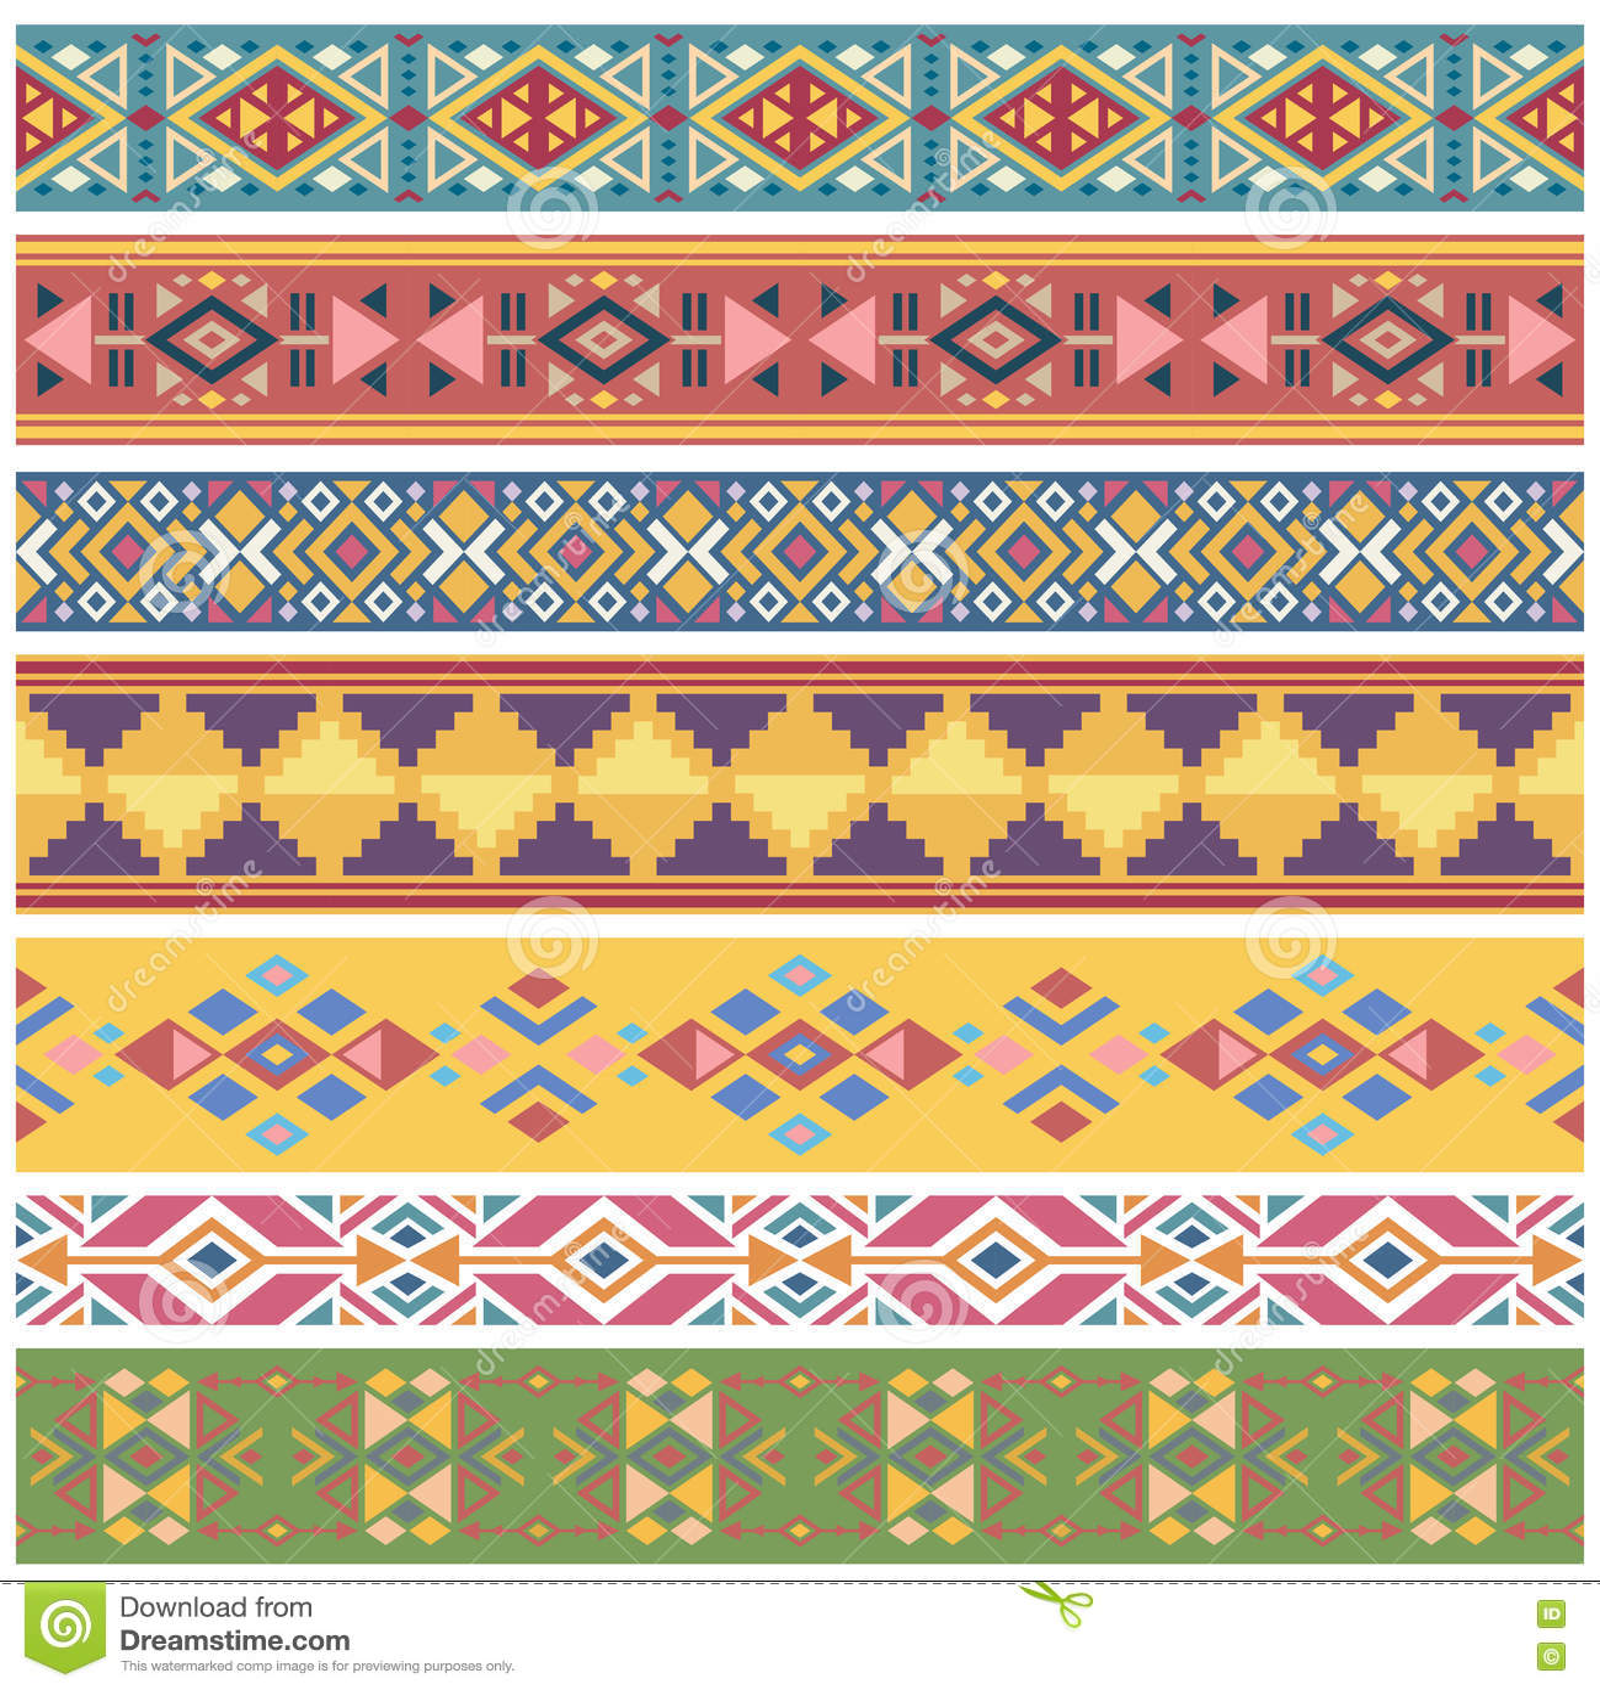 ancient geometric native american tribal graphics vector seamless